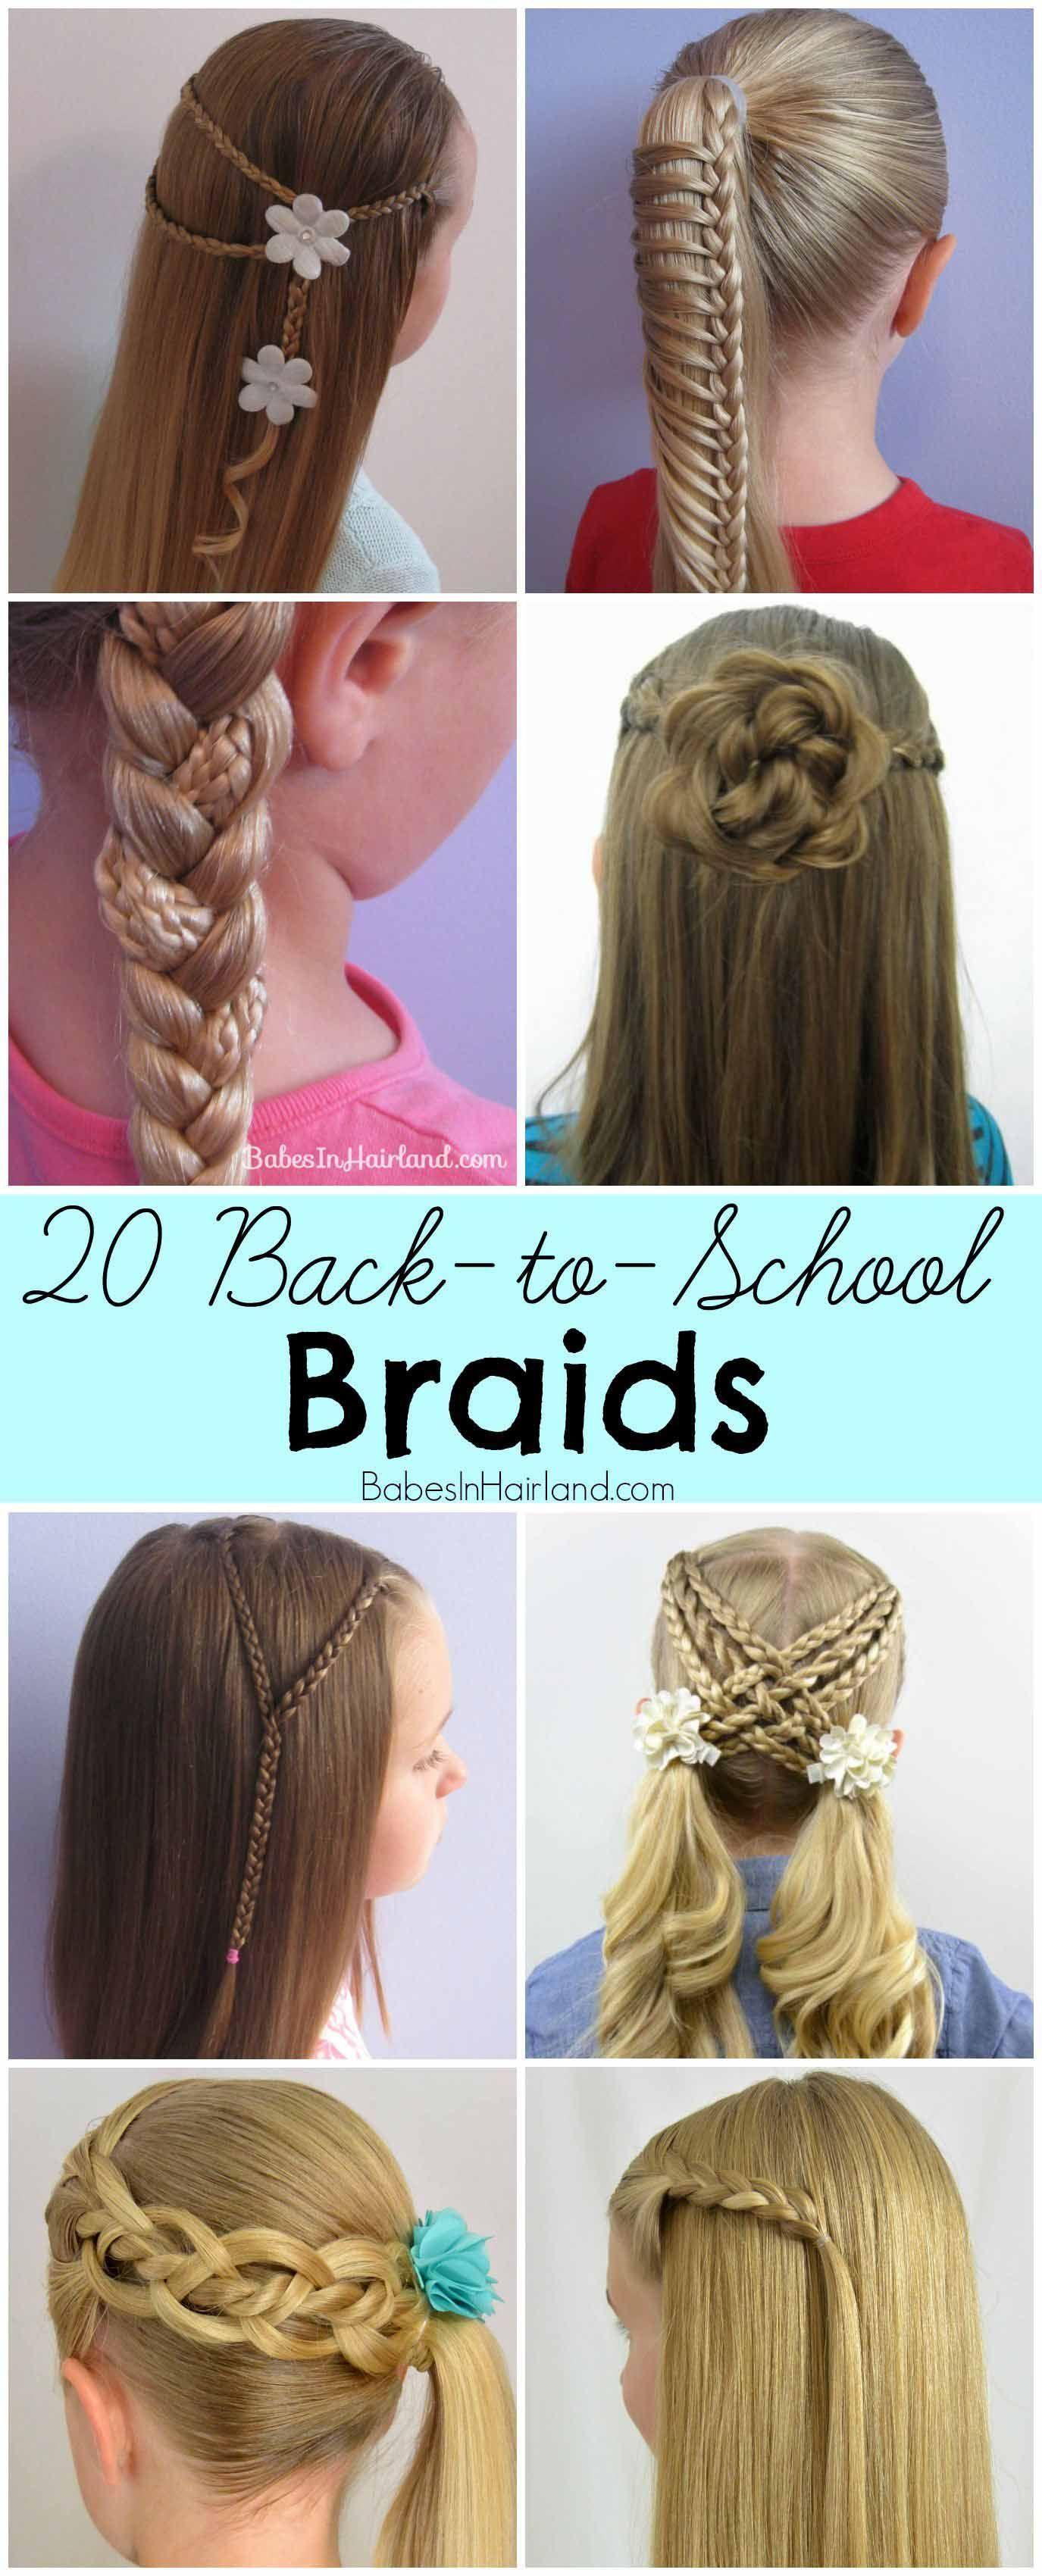 20 Back to School Braids